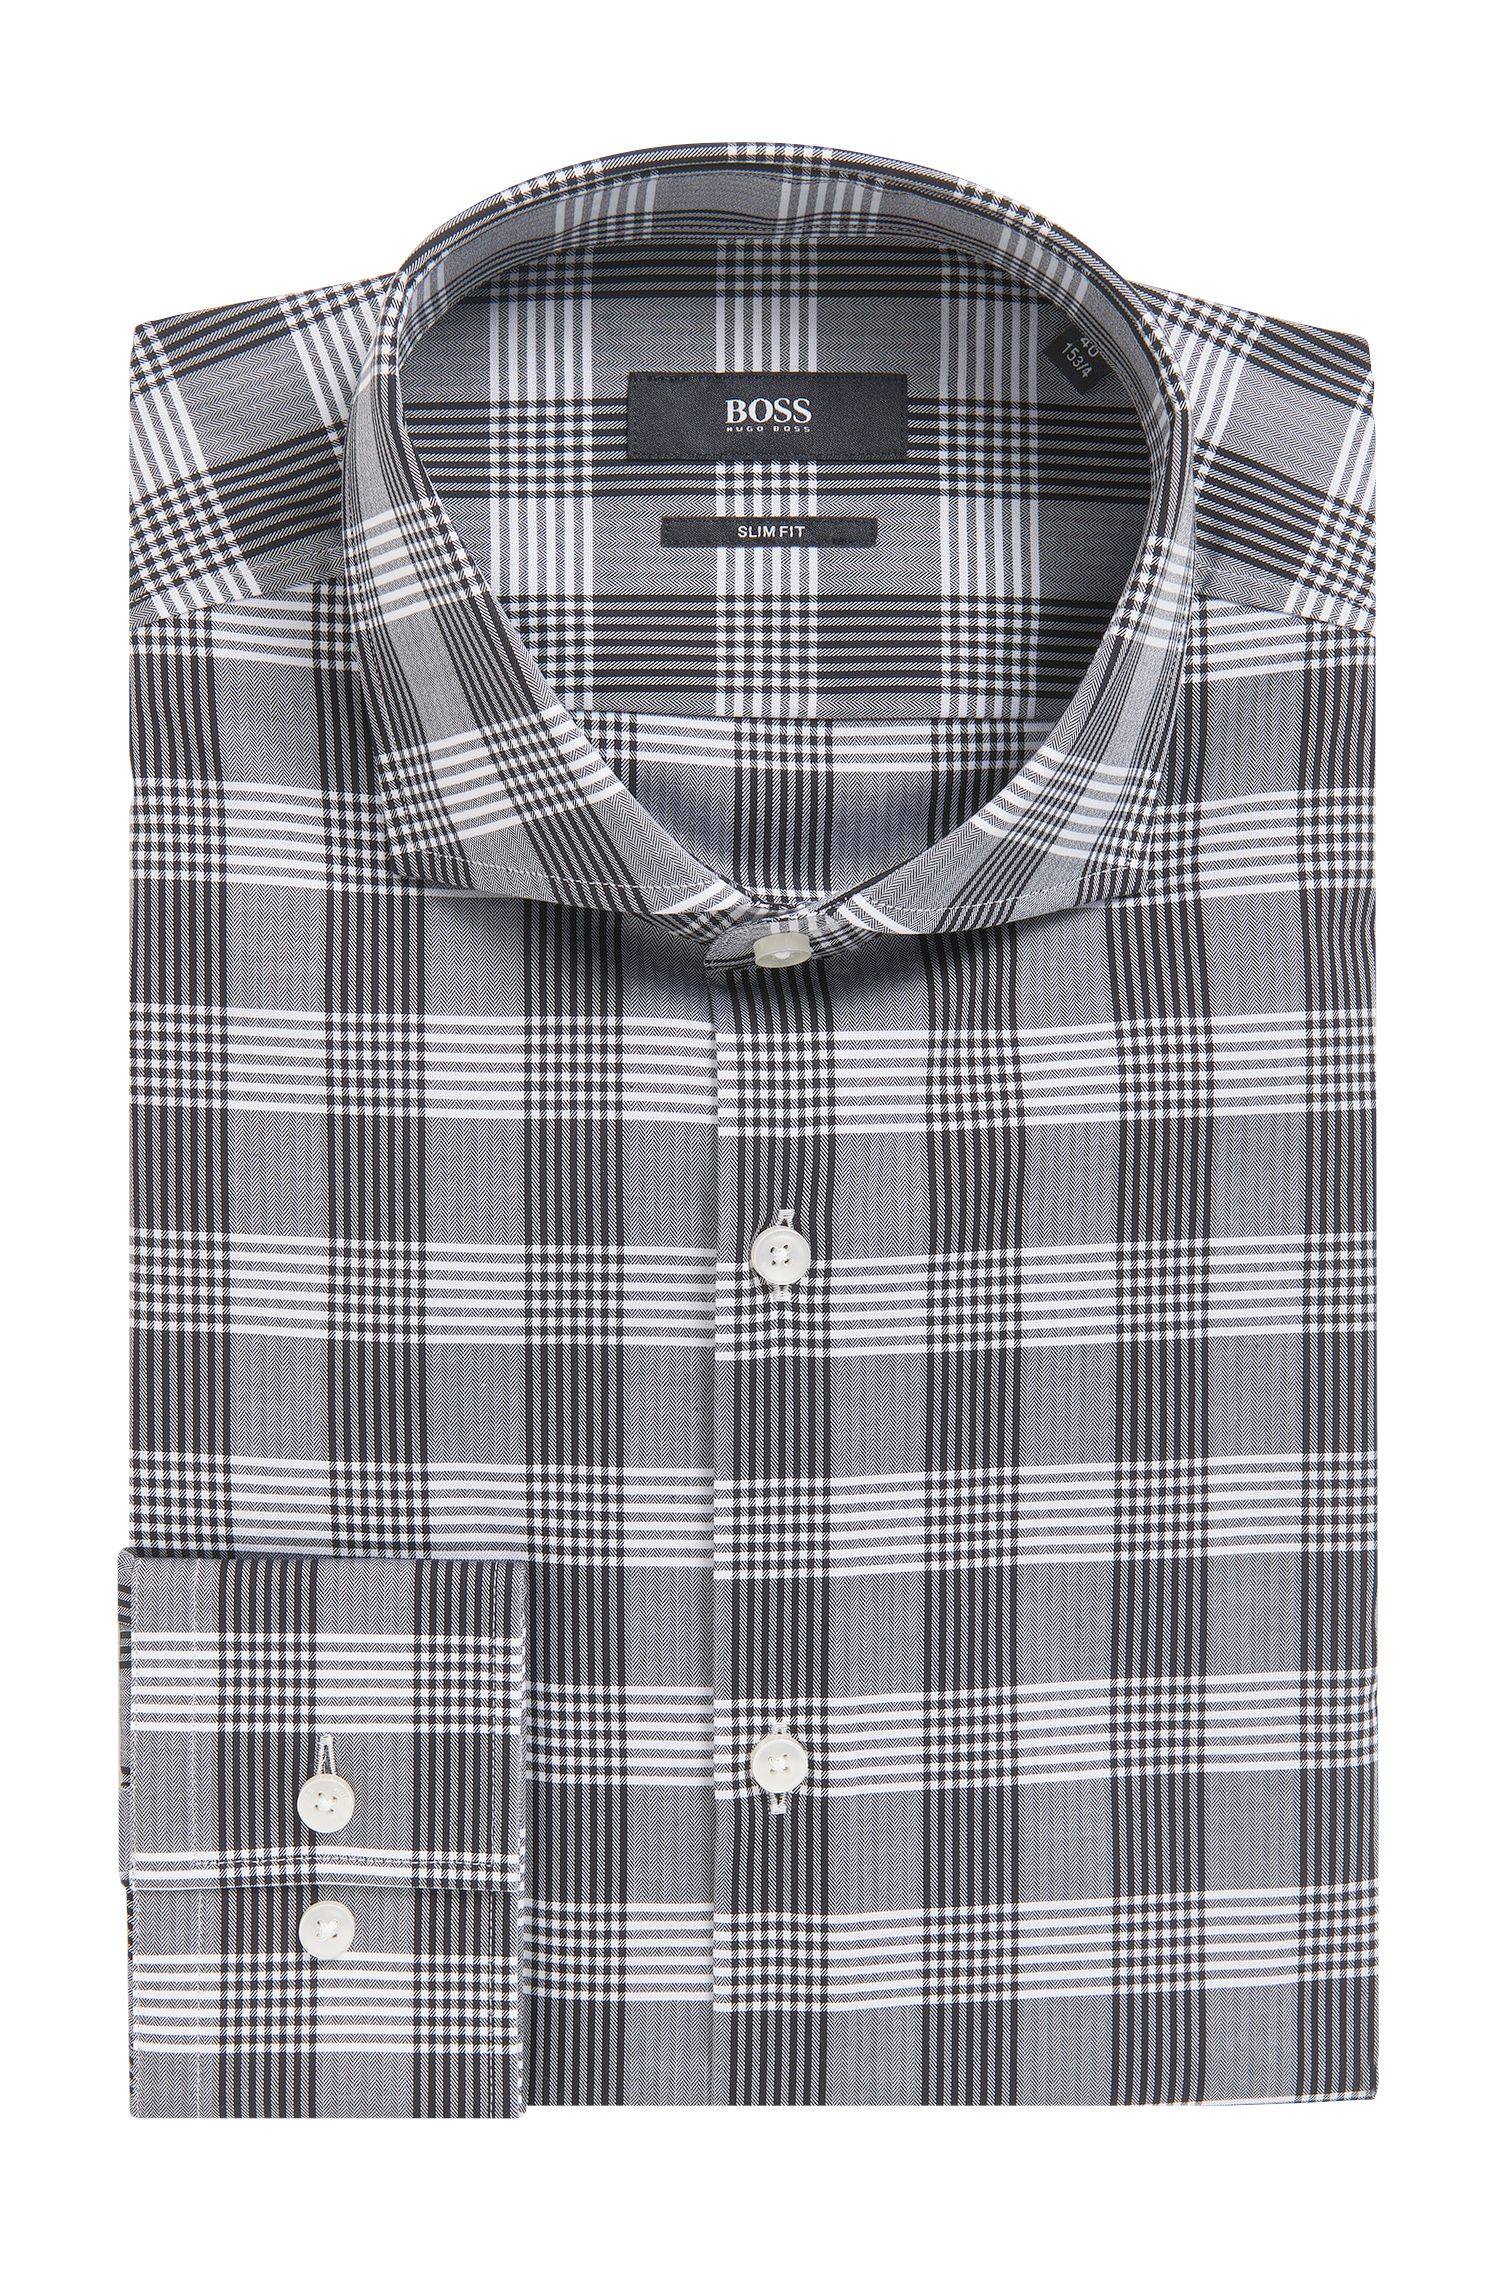 'Jason' | Slim Fit, Herringbone Check Cotton Dress Shirt